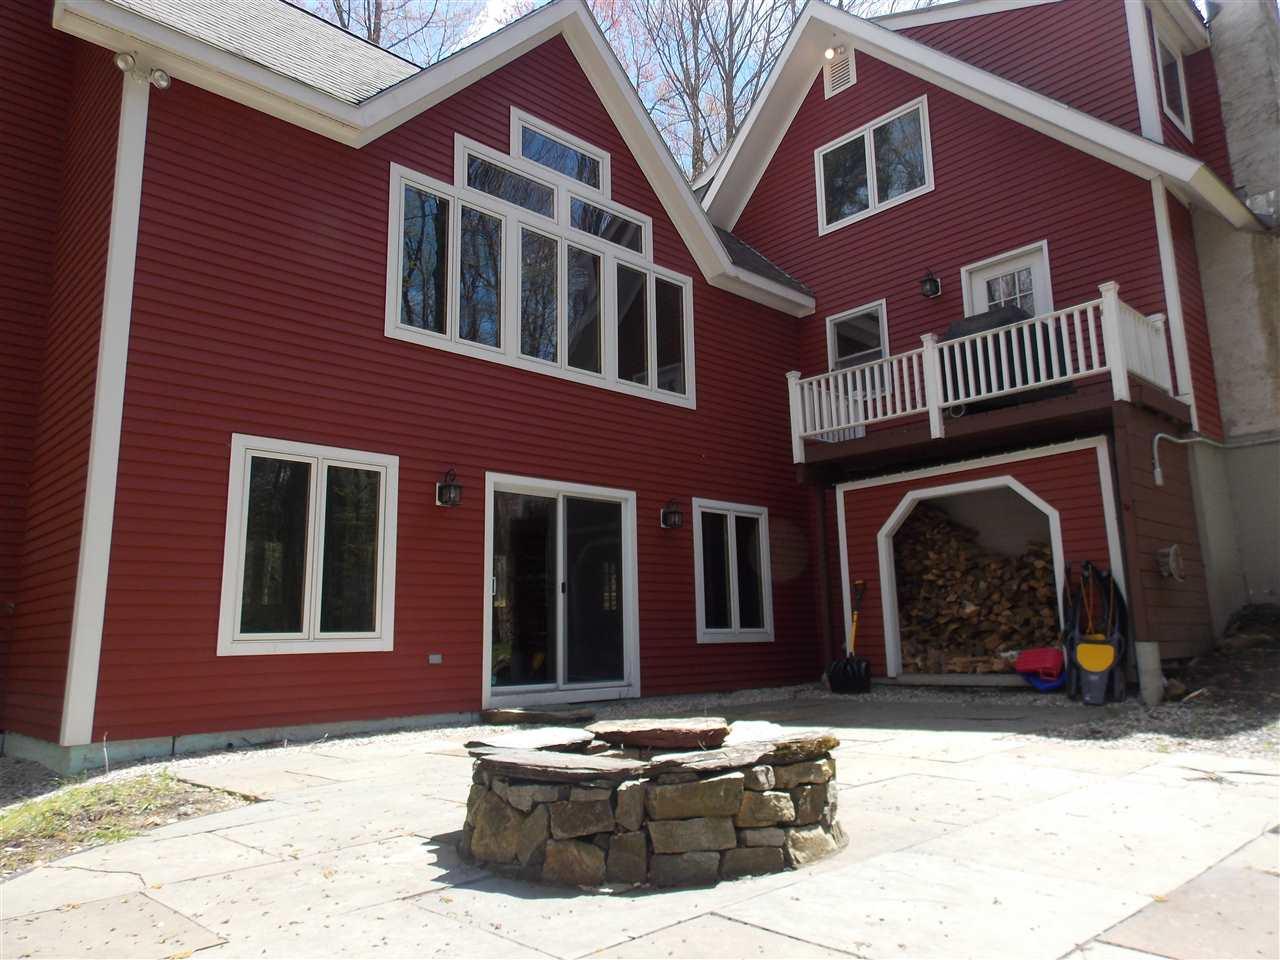 Mount-Snow-Real-Estate-4613854-17